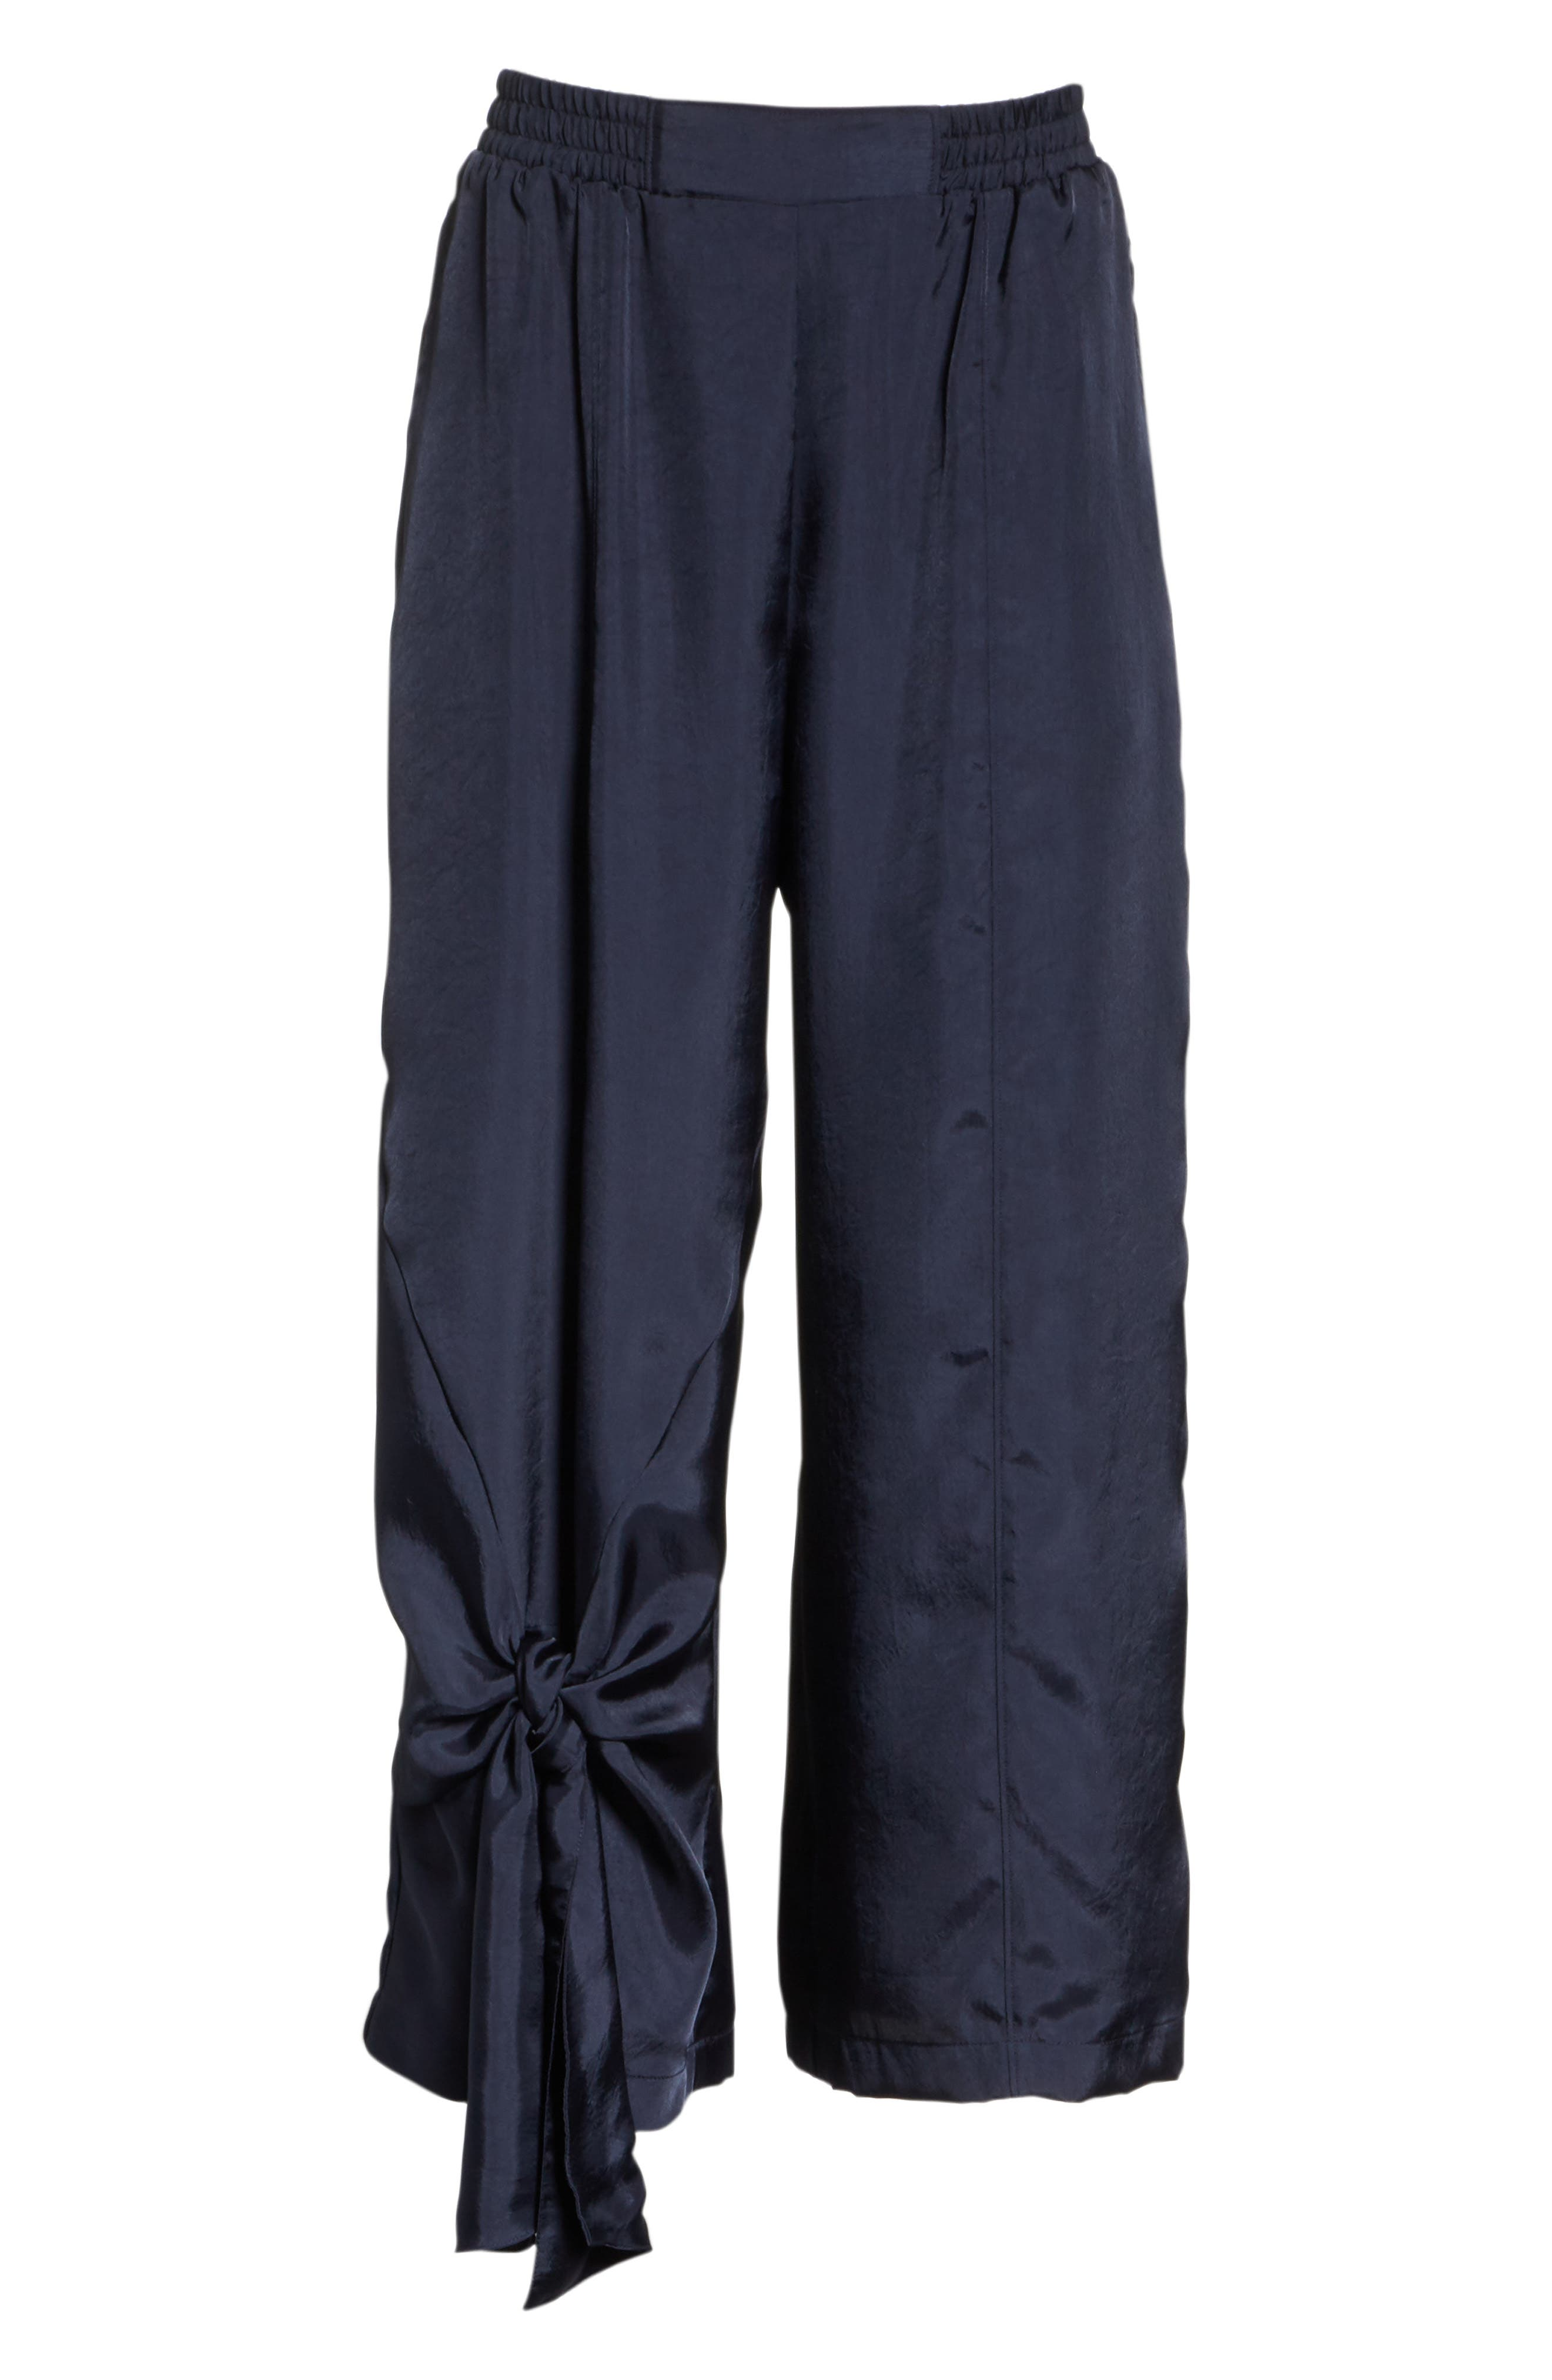 Tie Detail Crop Pants,                             Alternate thumbnail 6, color,                             NAVY